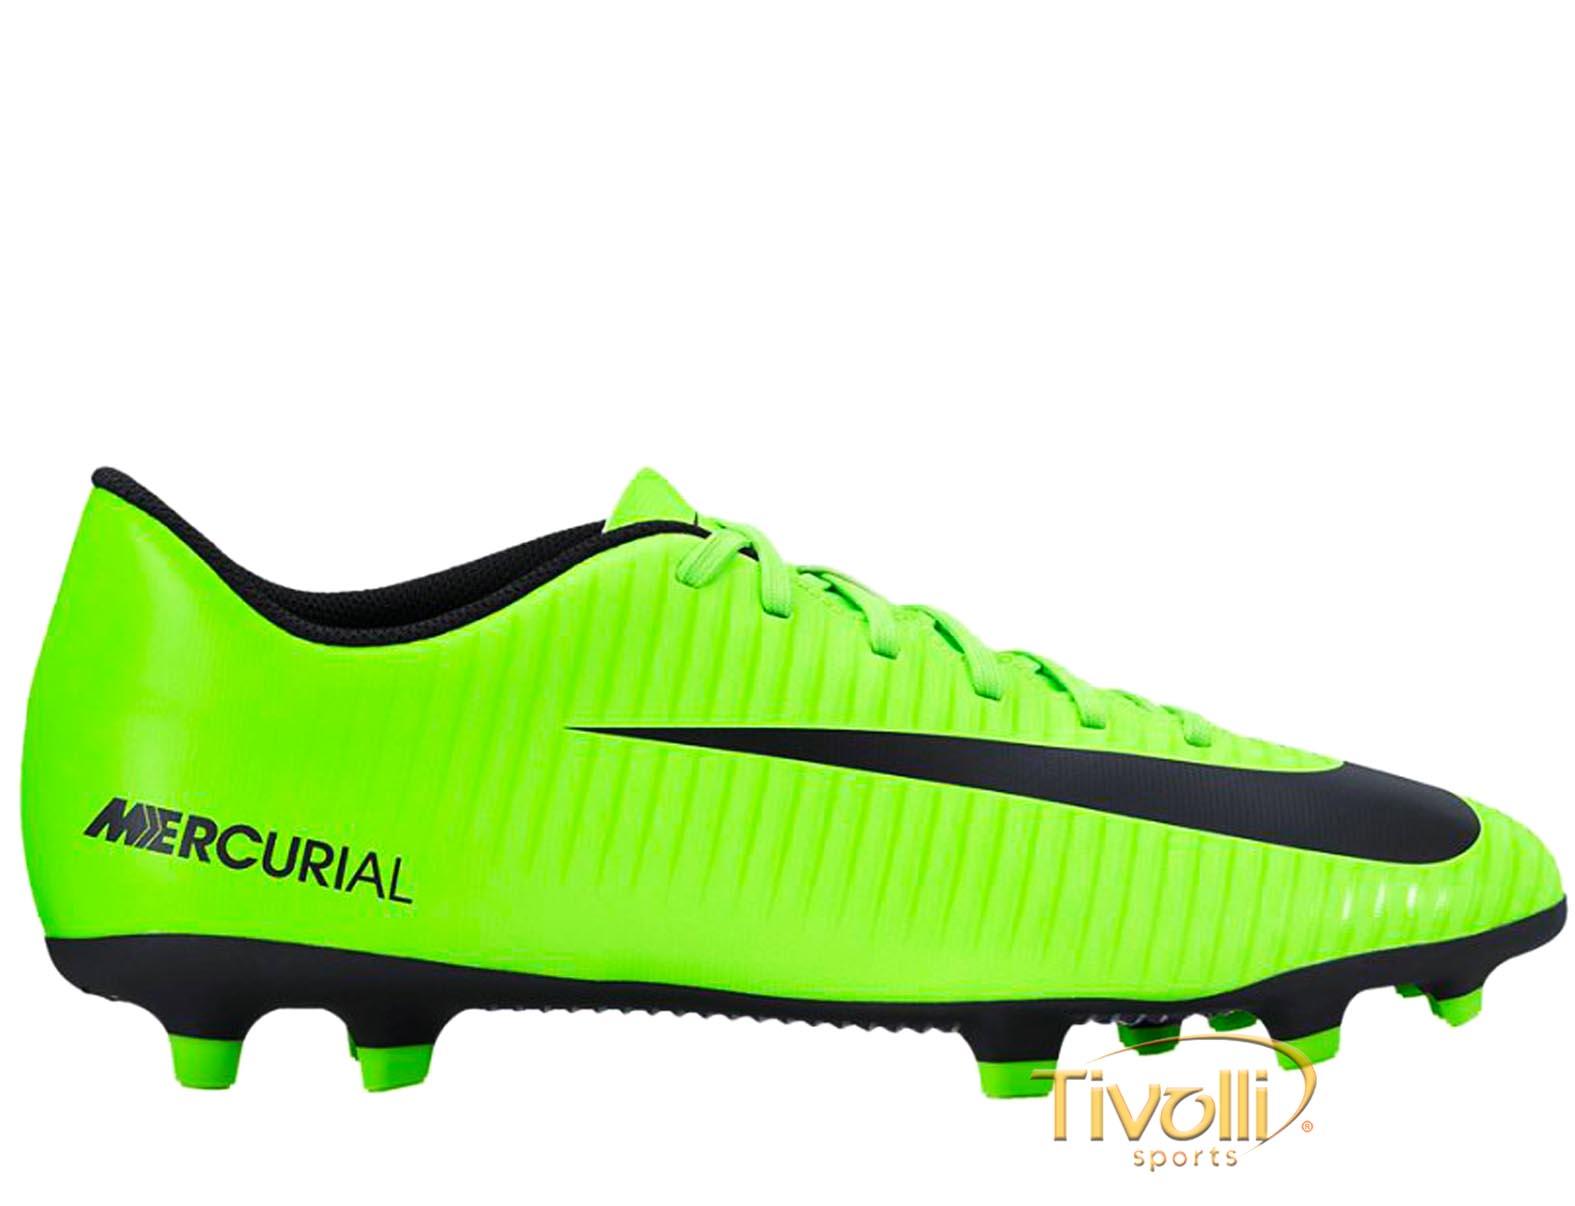 b0a416e10cf25 Chuteira Nike Mercurial Vortex III FG Campo